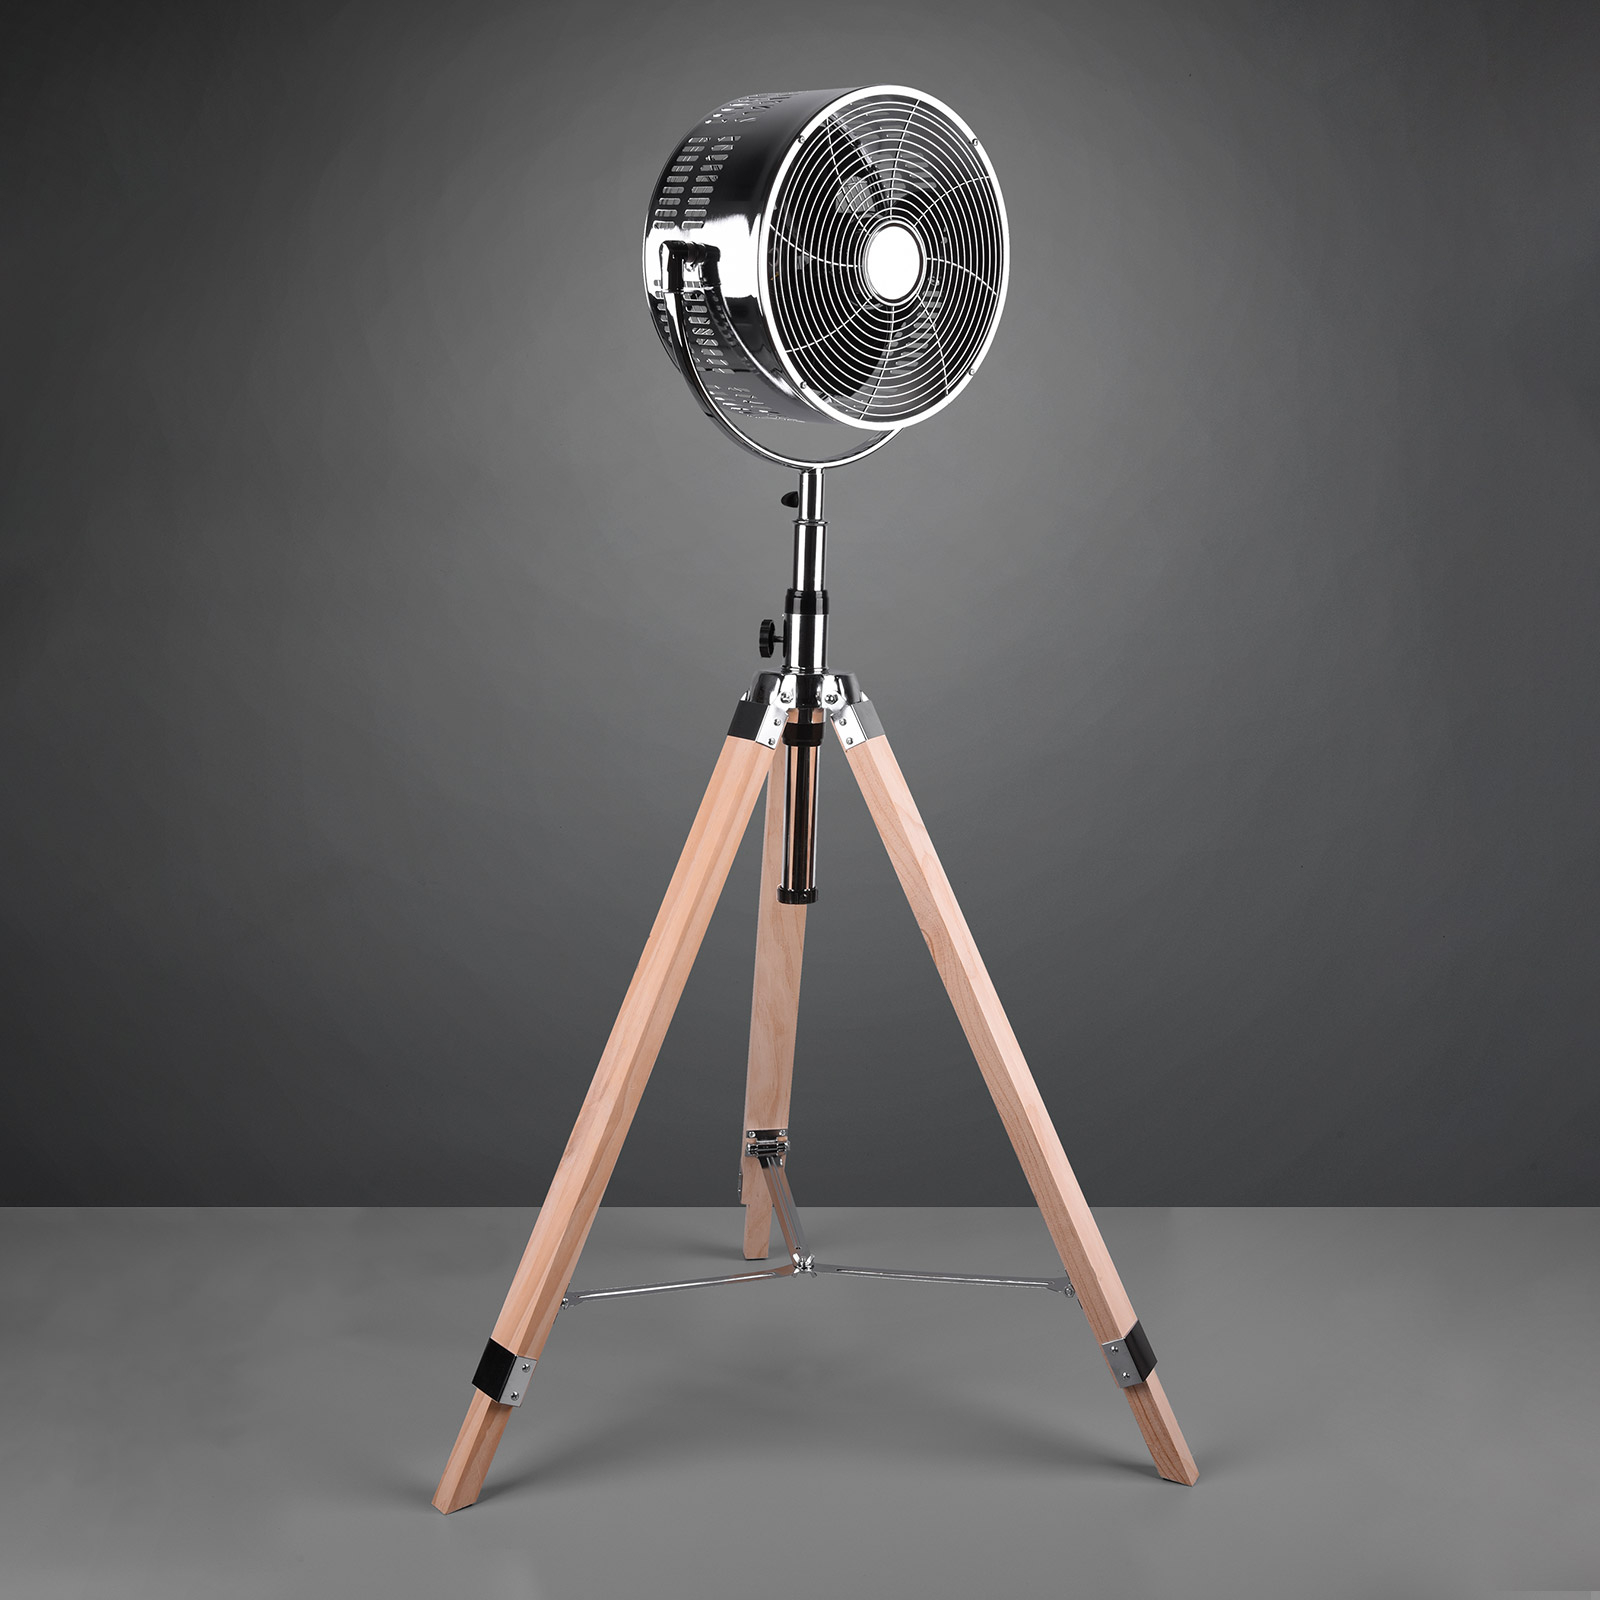 Standventilator Tromsö, Dreibein aus Holz